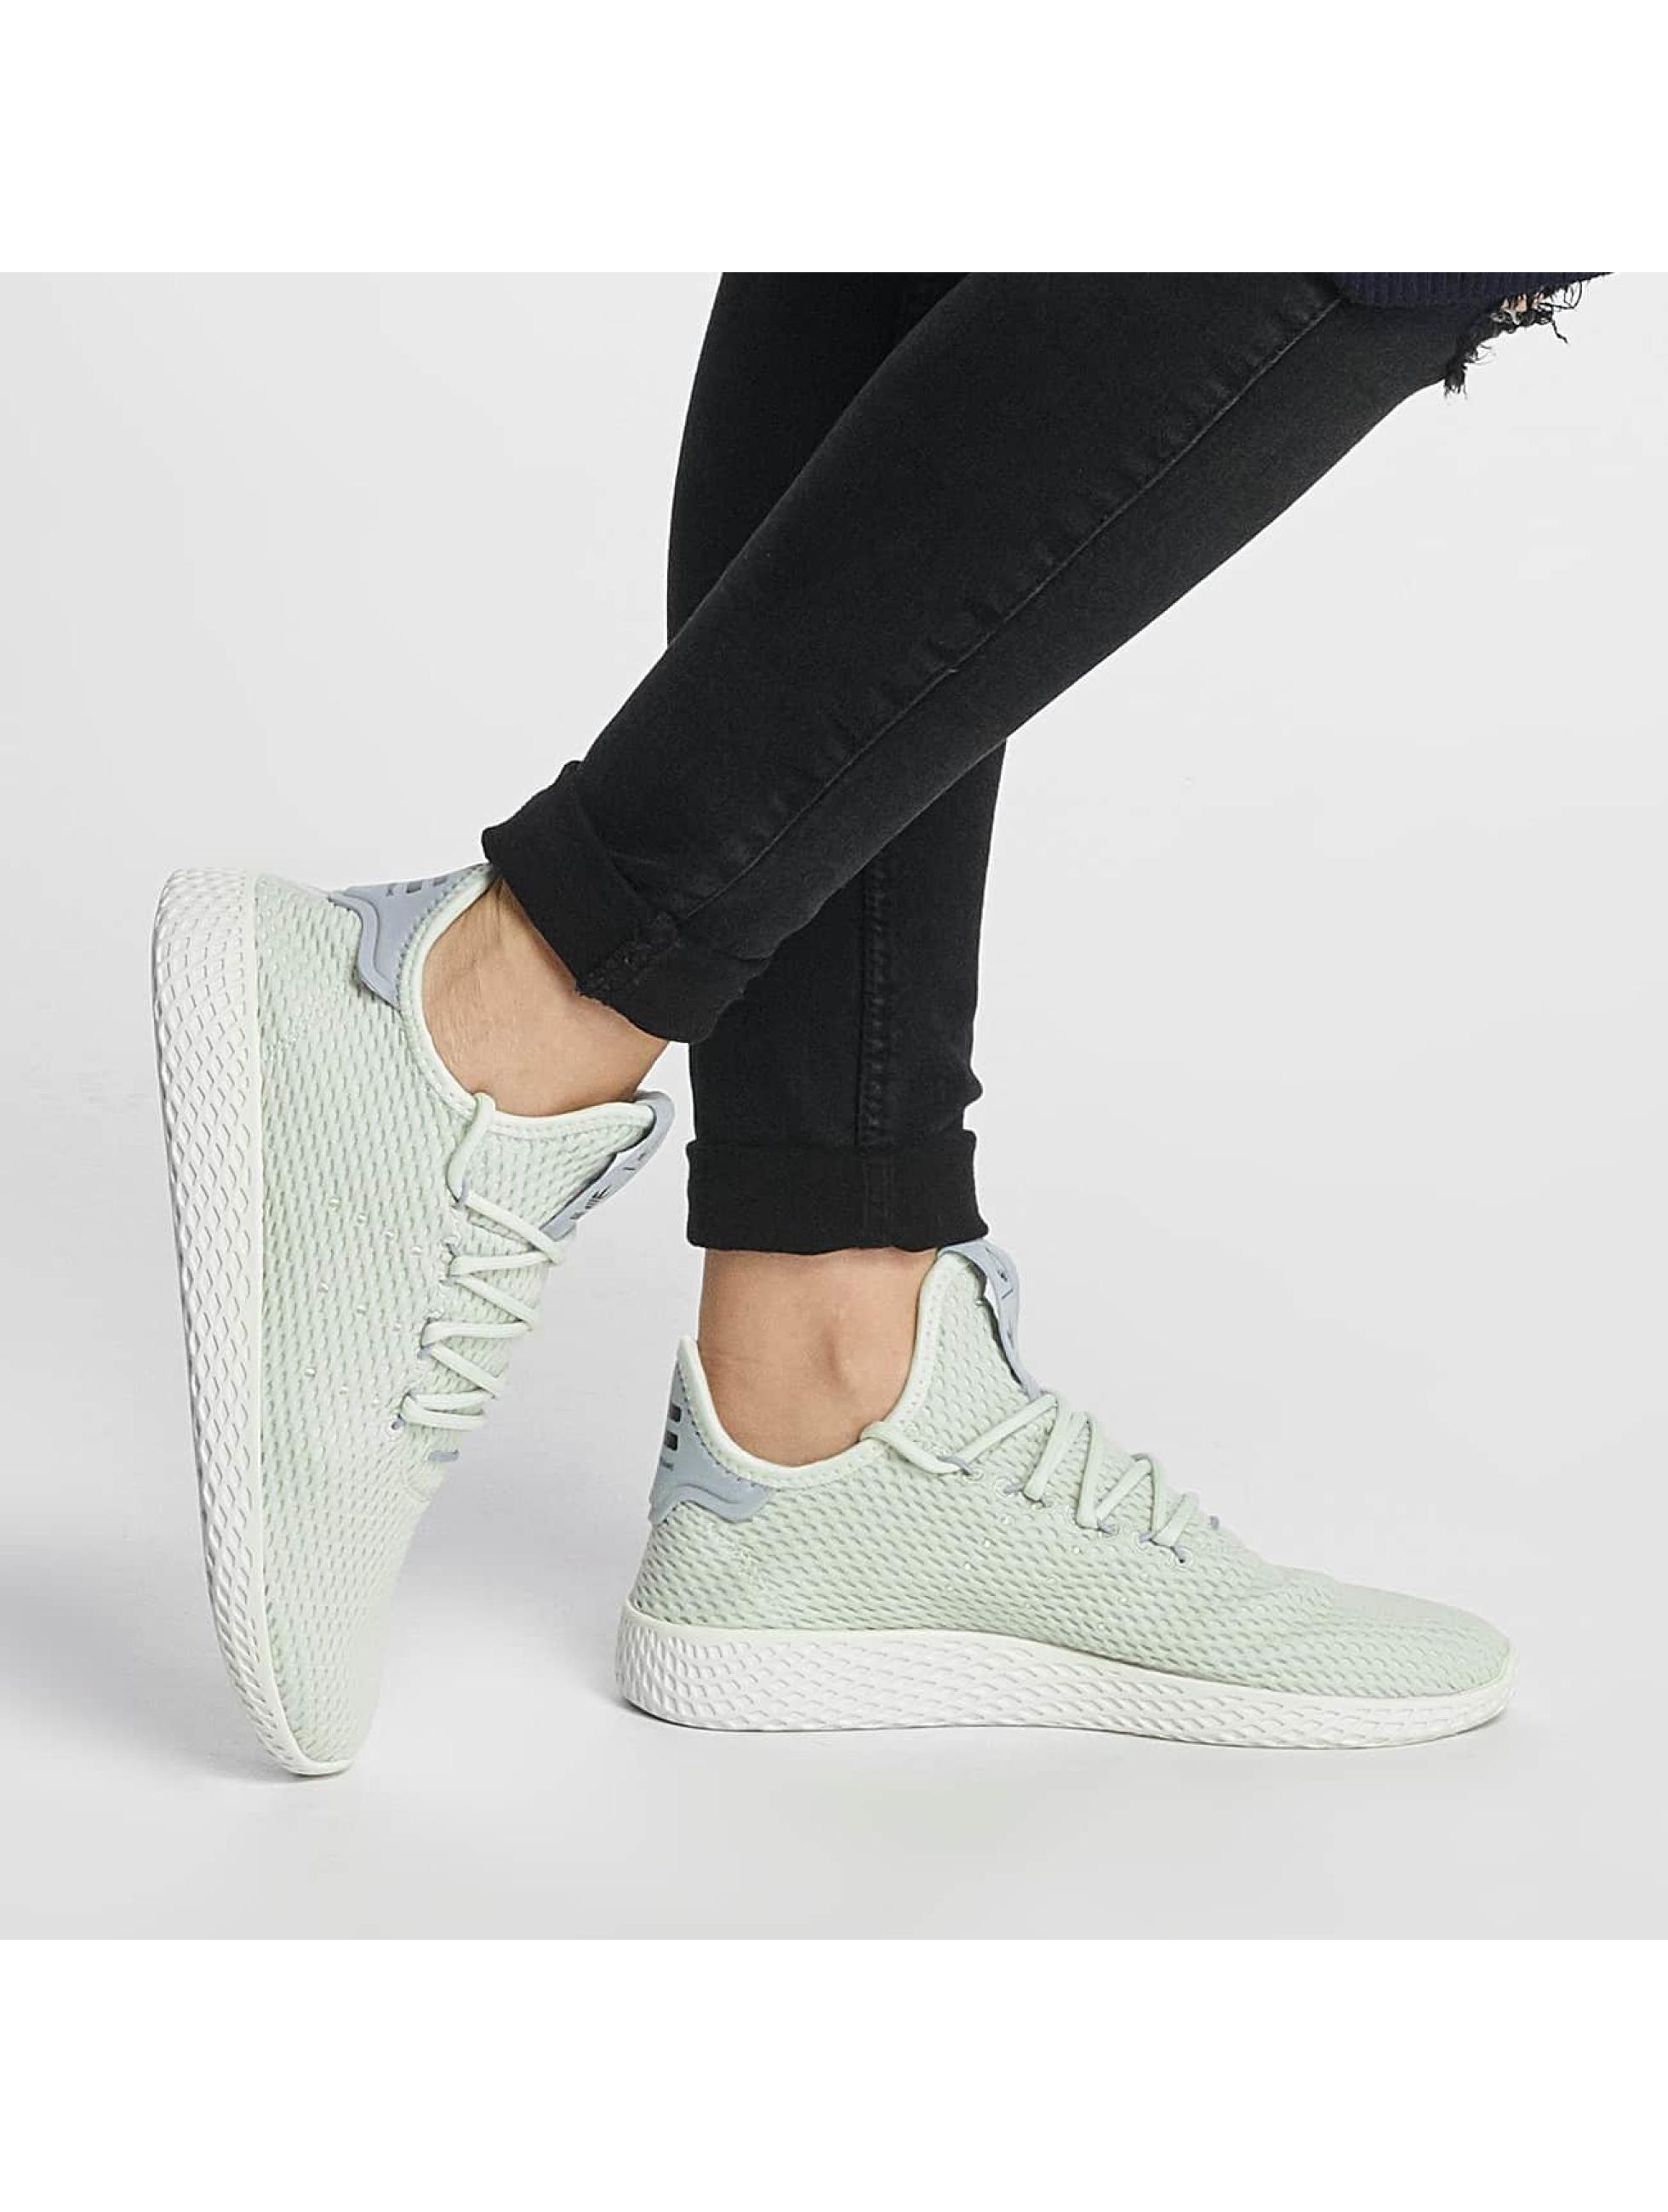 adidas Sneakers PW Tennis HU J green